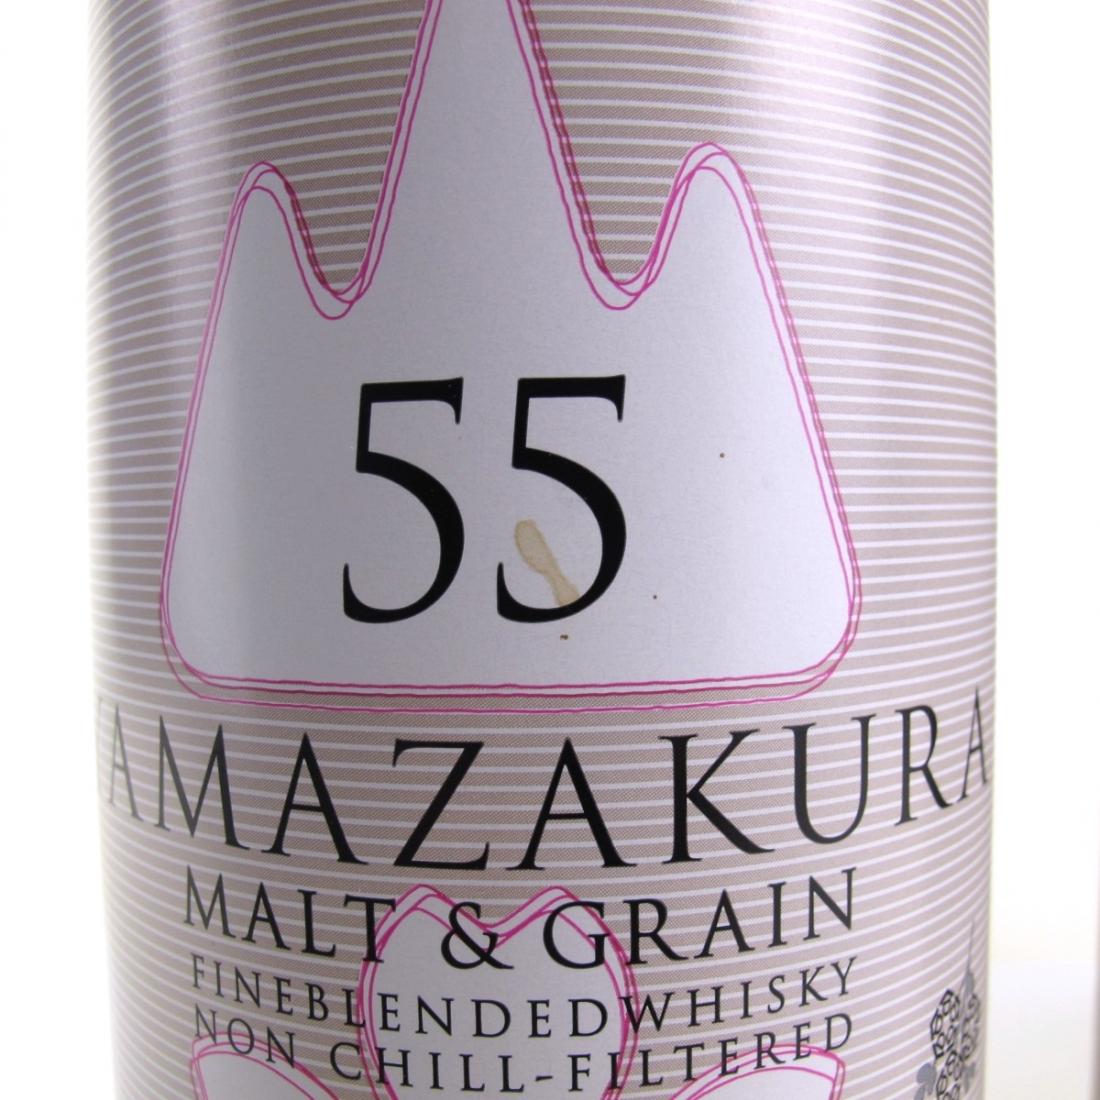 Yamazakura 55 Malt and Grain Blend